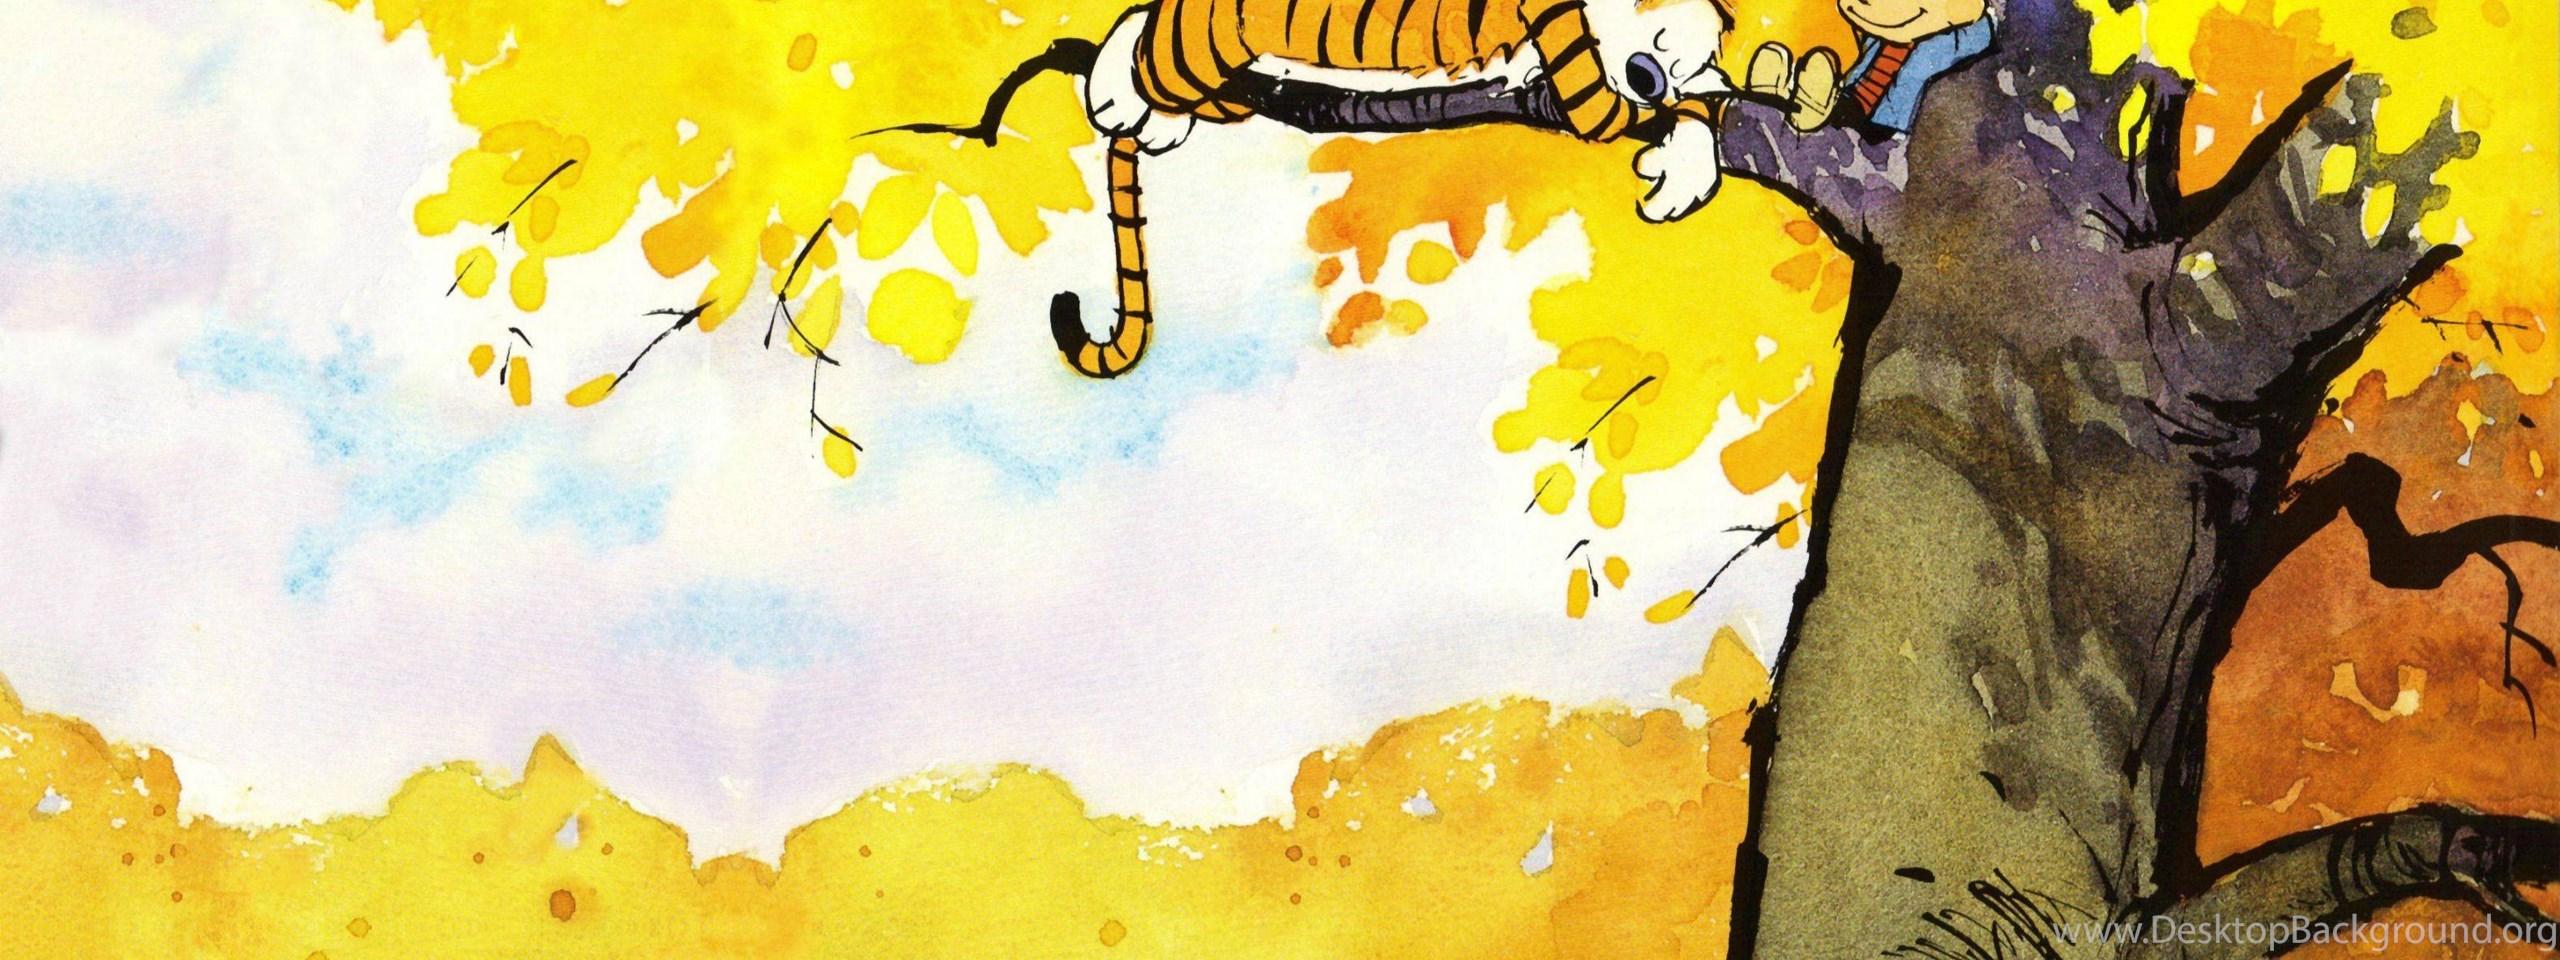 Calvin And Hobbes Wallpapers Pics Desktop Background 2560x960